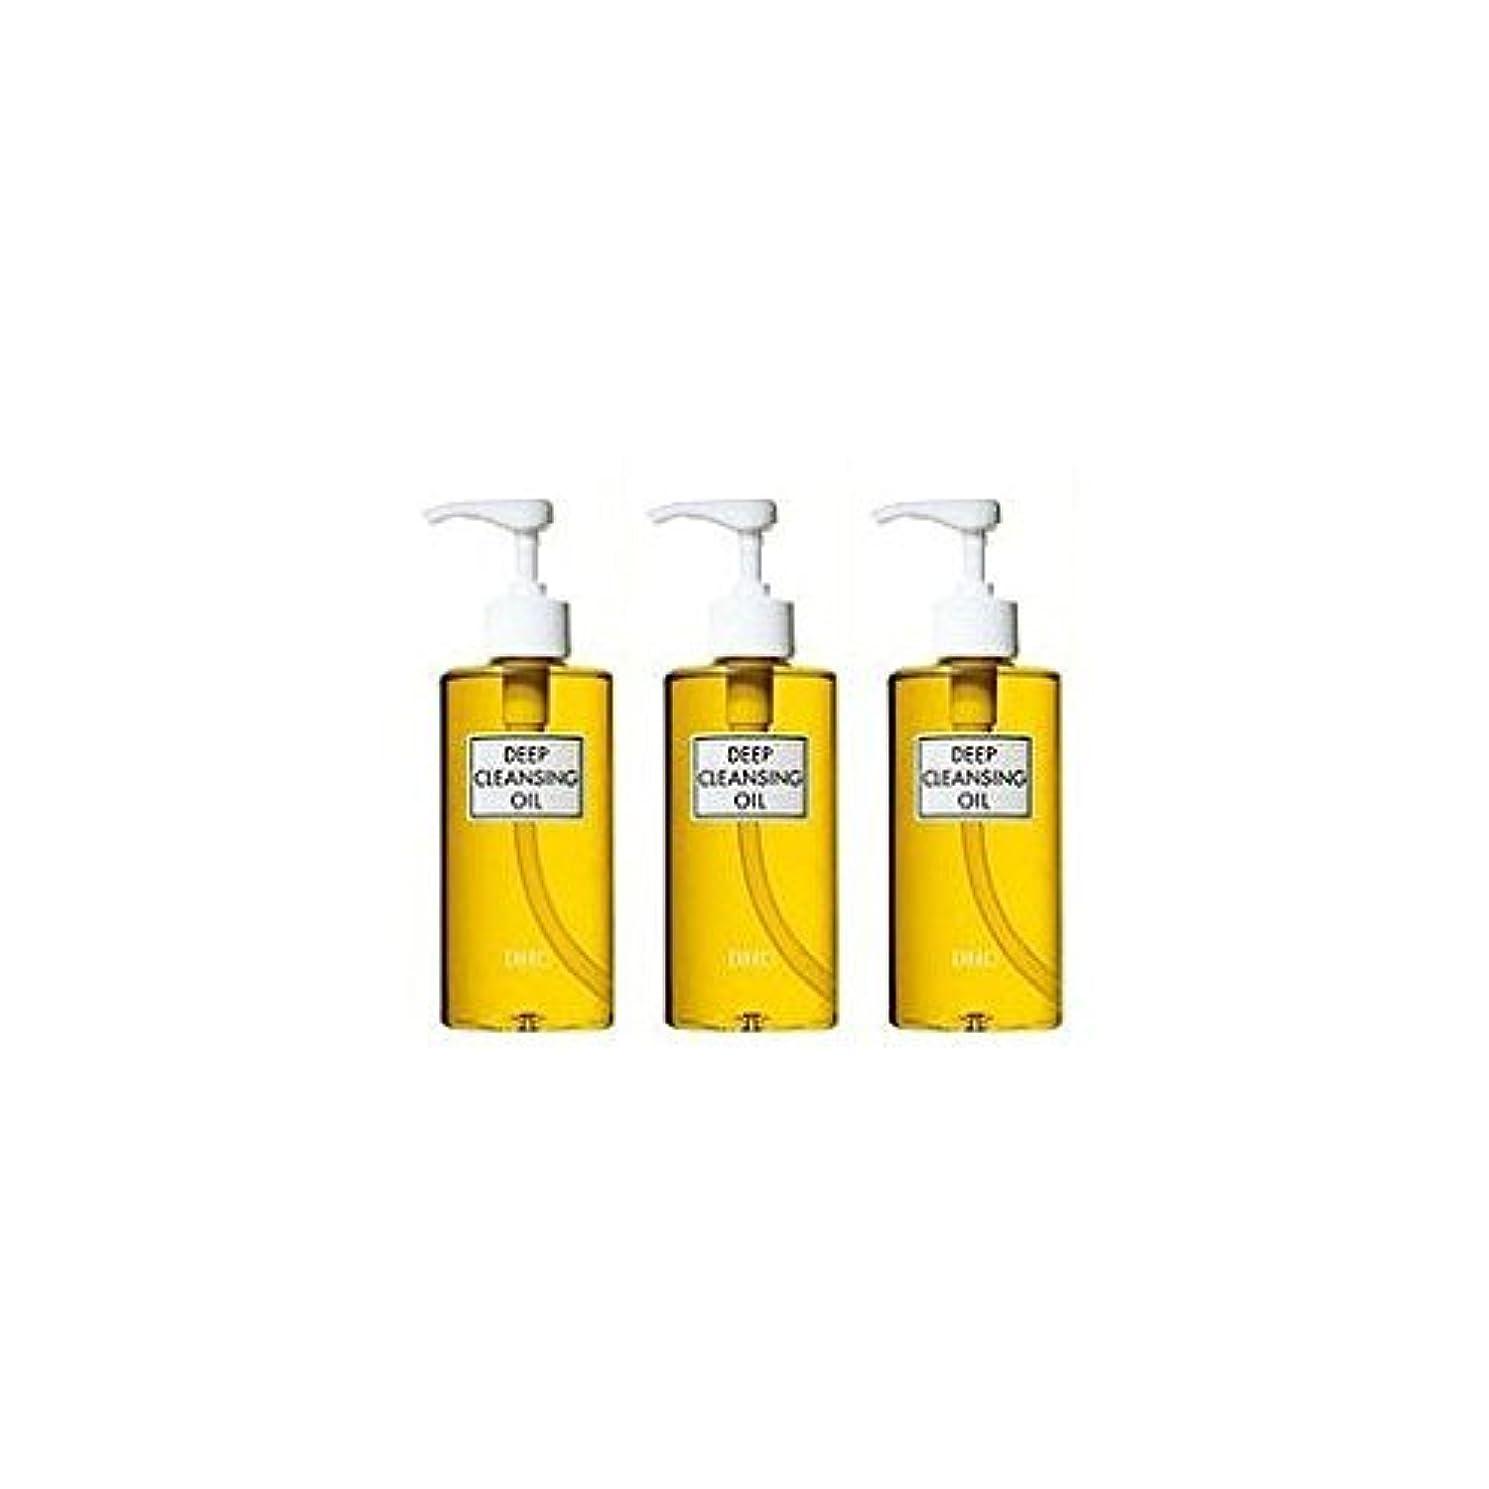 DHC薬用ディープクレンジングオイル(L)3本セット